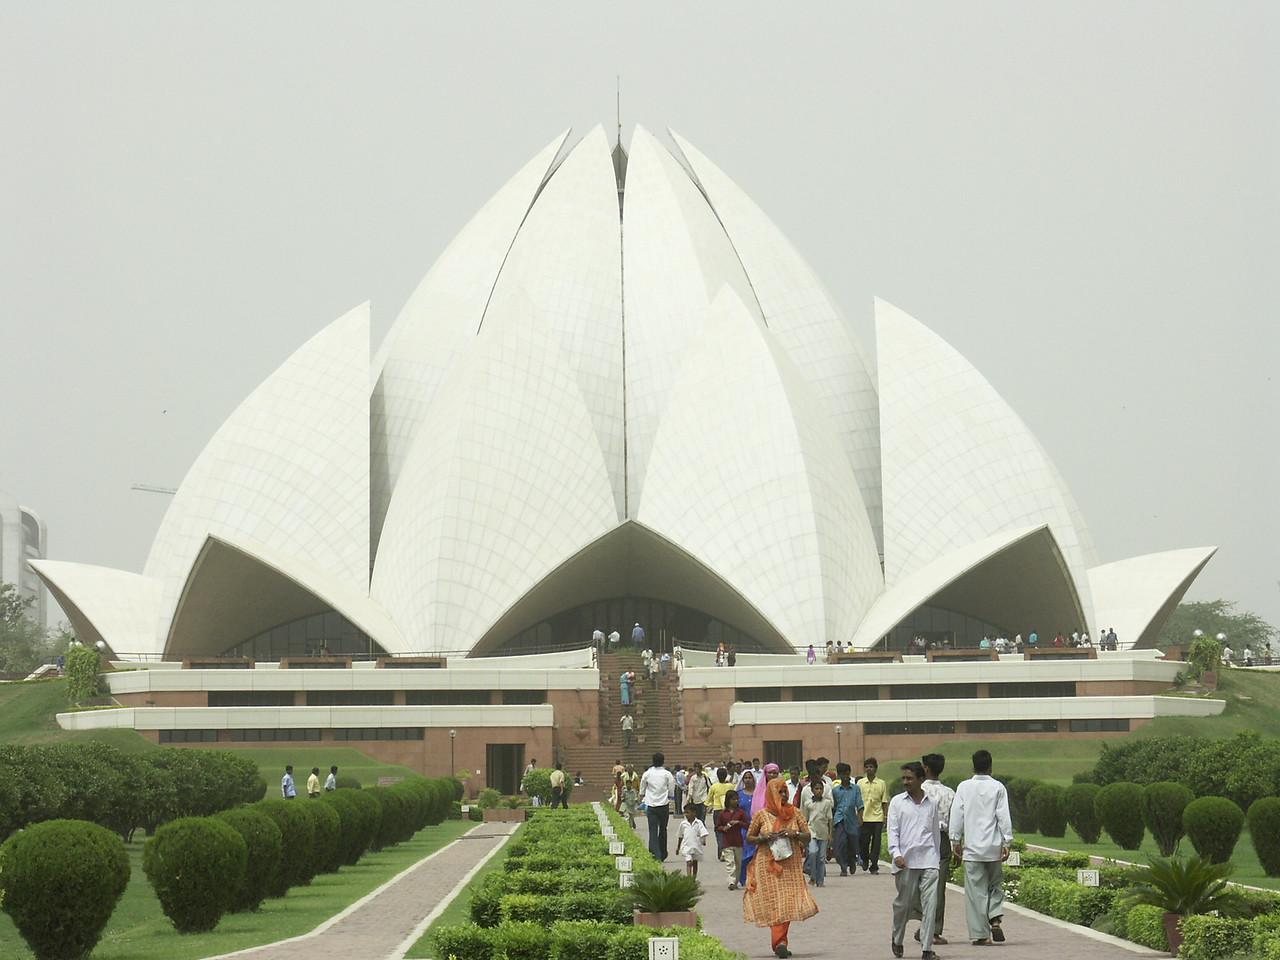 Delhi, India: The Ba'hai House of Worship